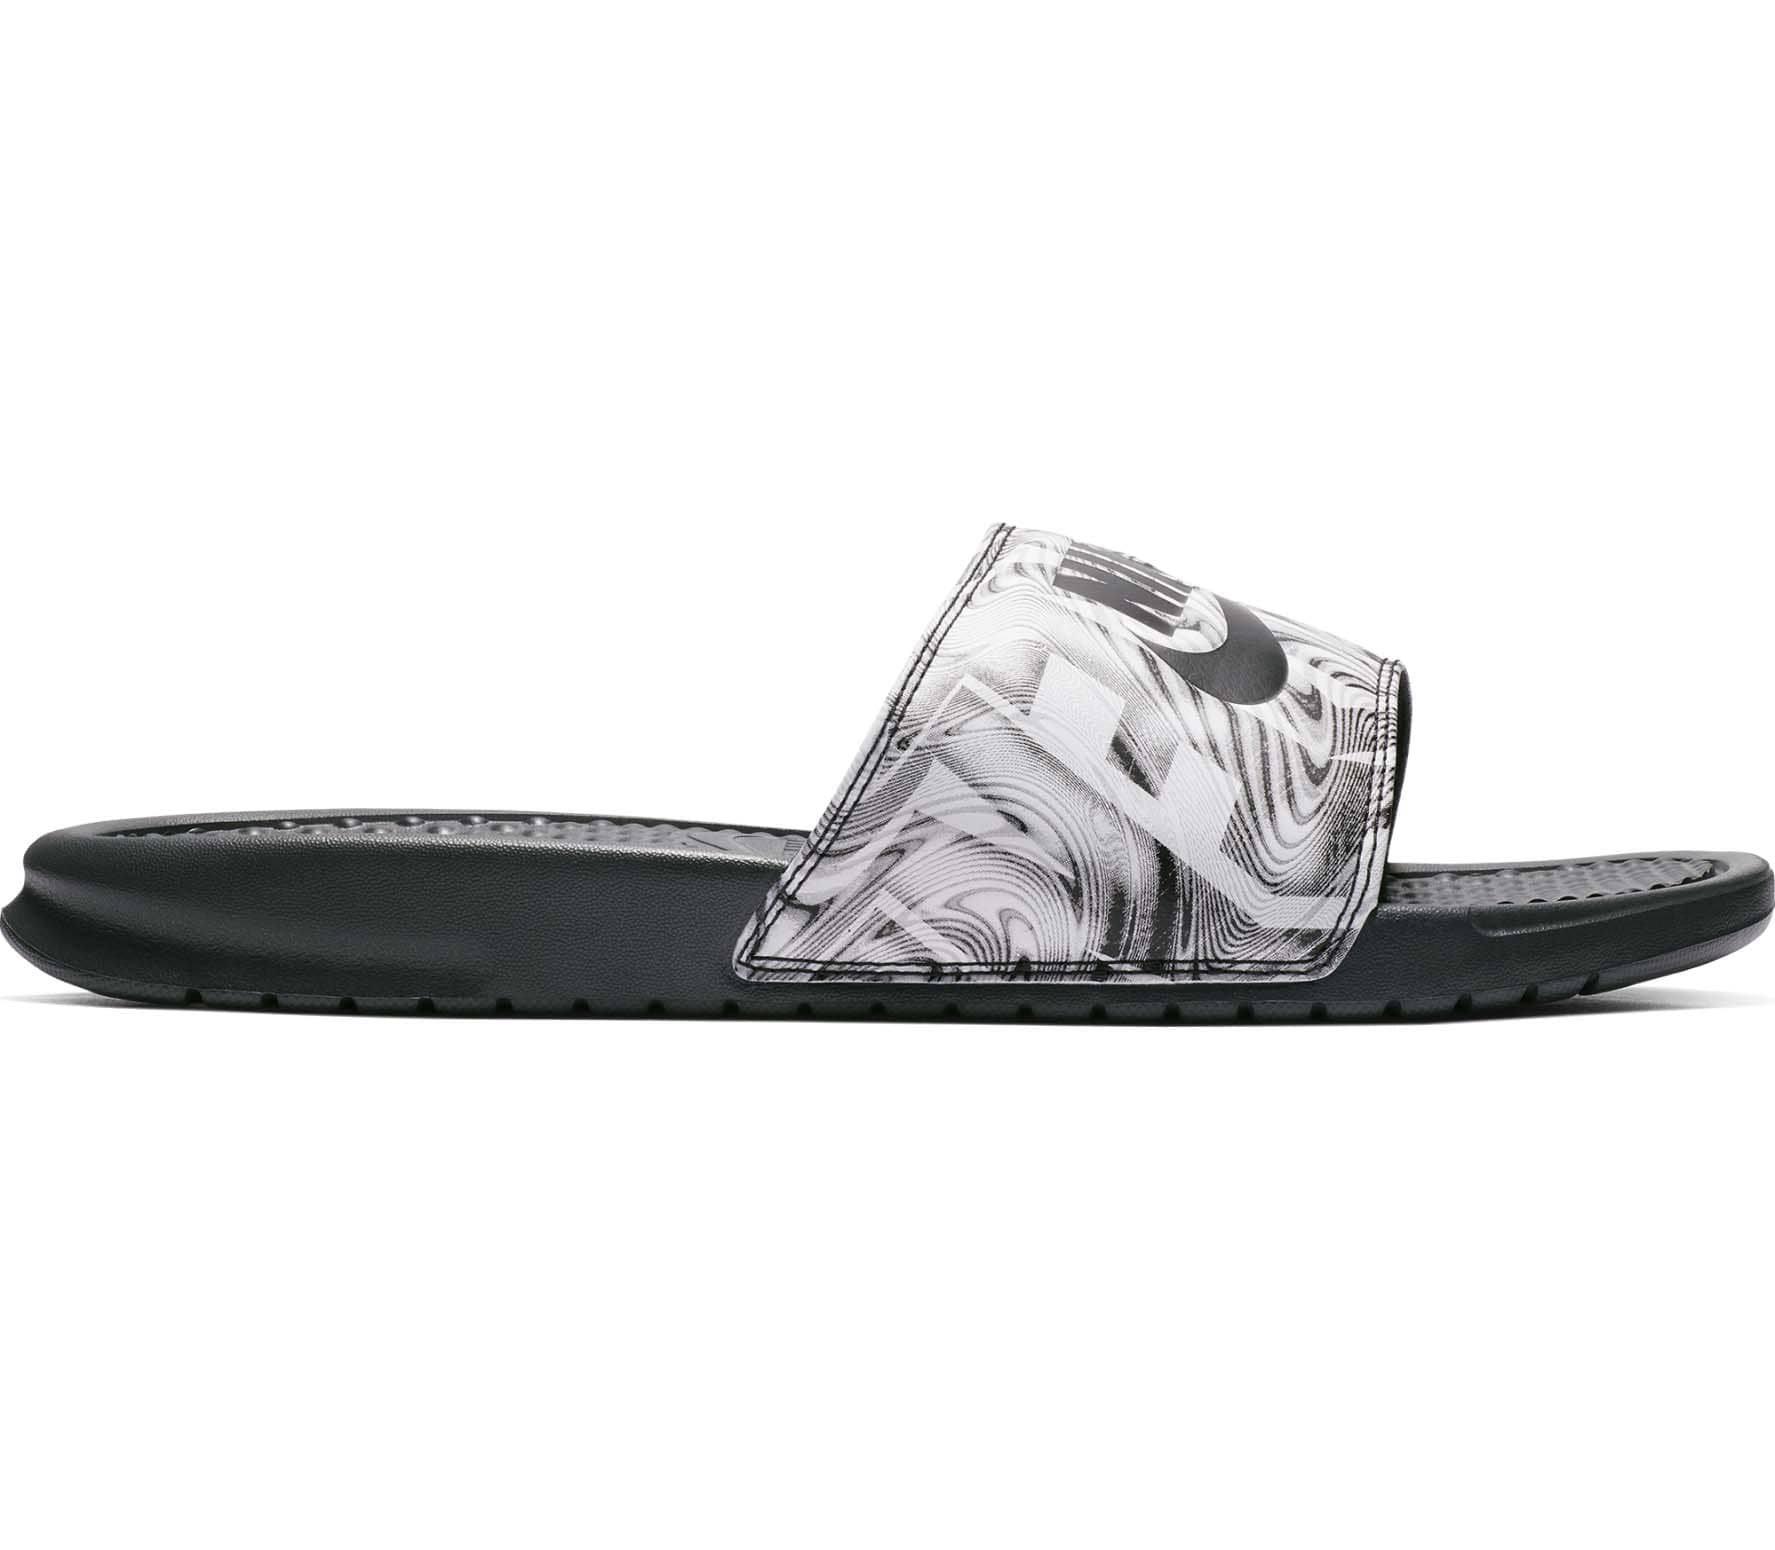 Anthrazit schwarz Schwarz Jdi Benassi Nike badeslipper Printed Herren Ypx1q0